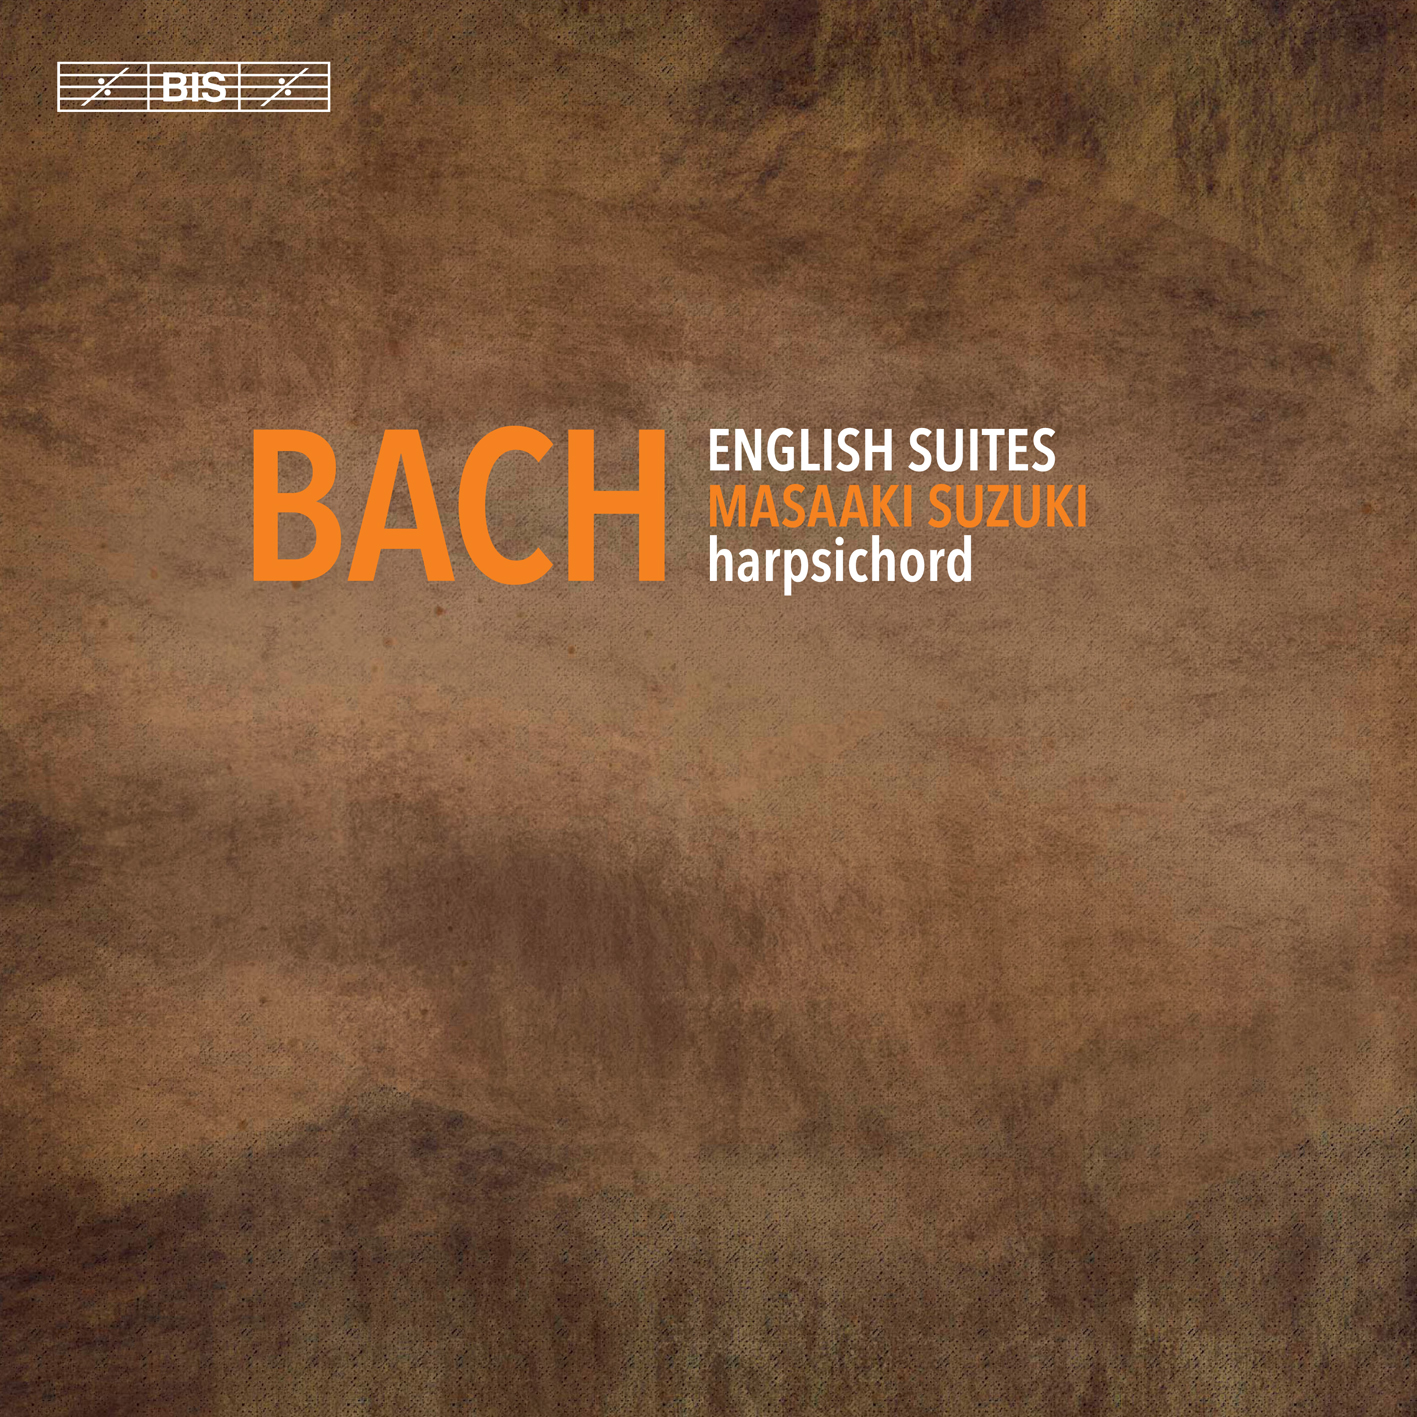 Amber Bach eclassical - johann sebastian bach – english suites